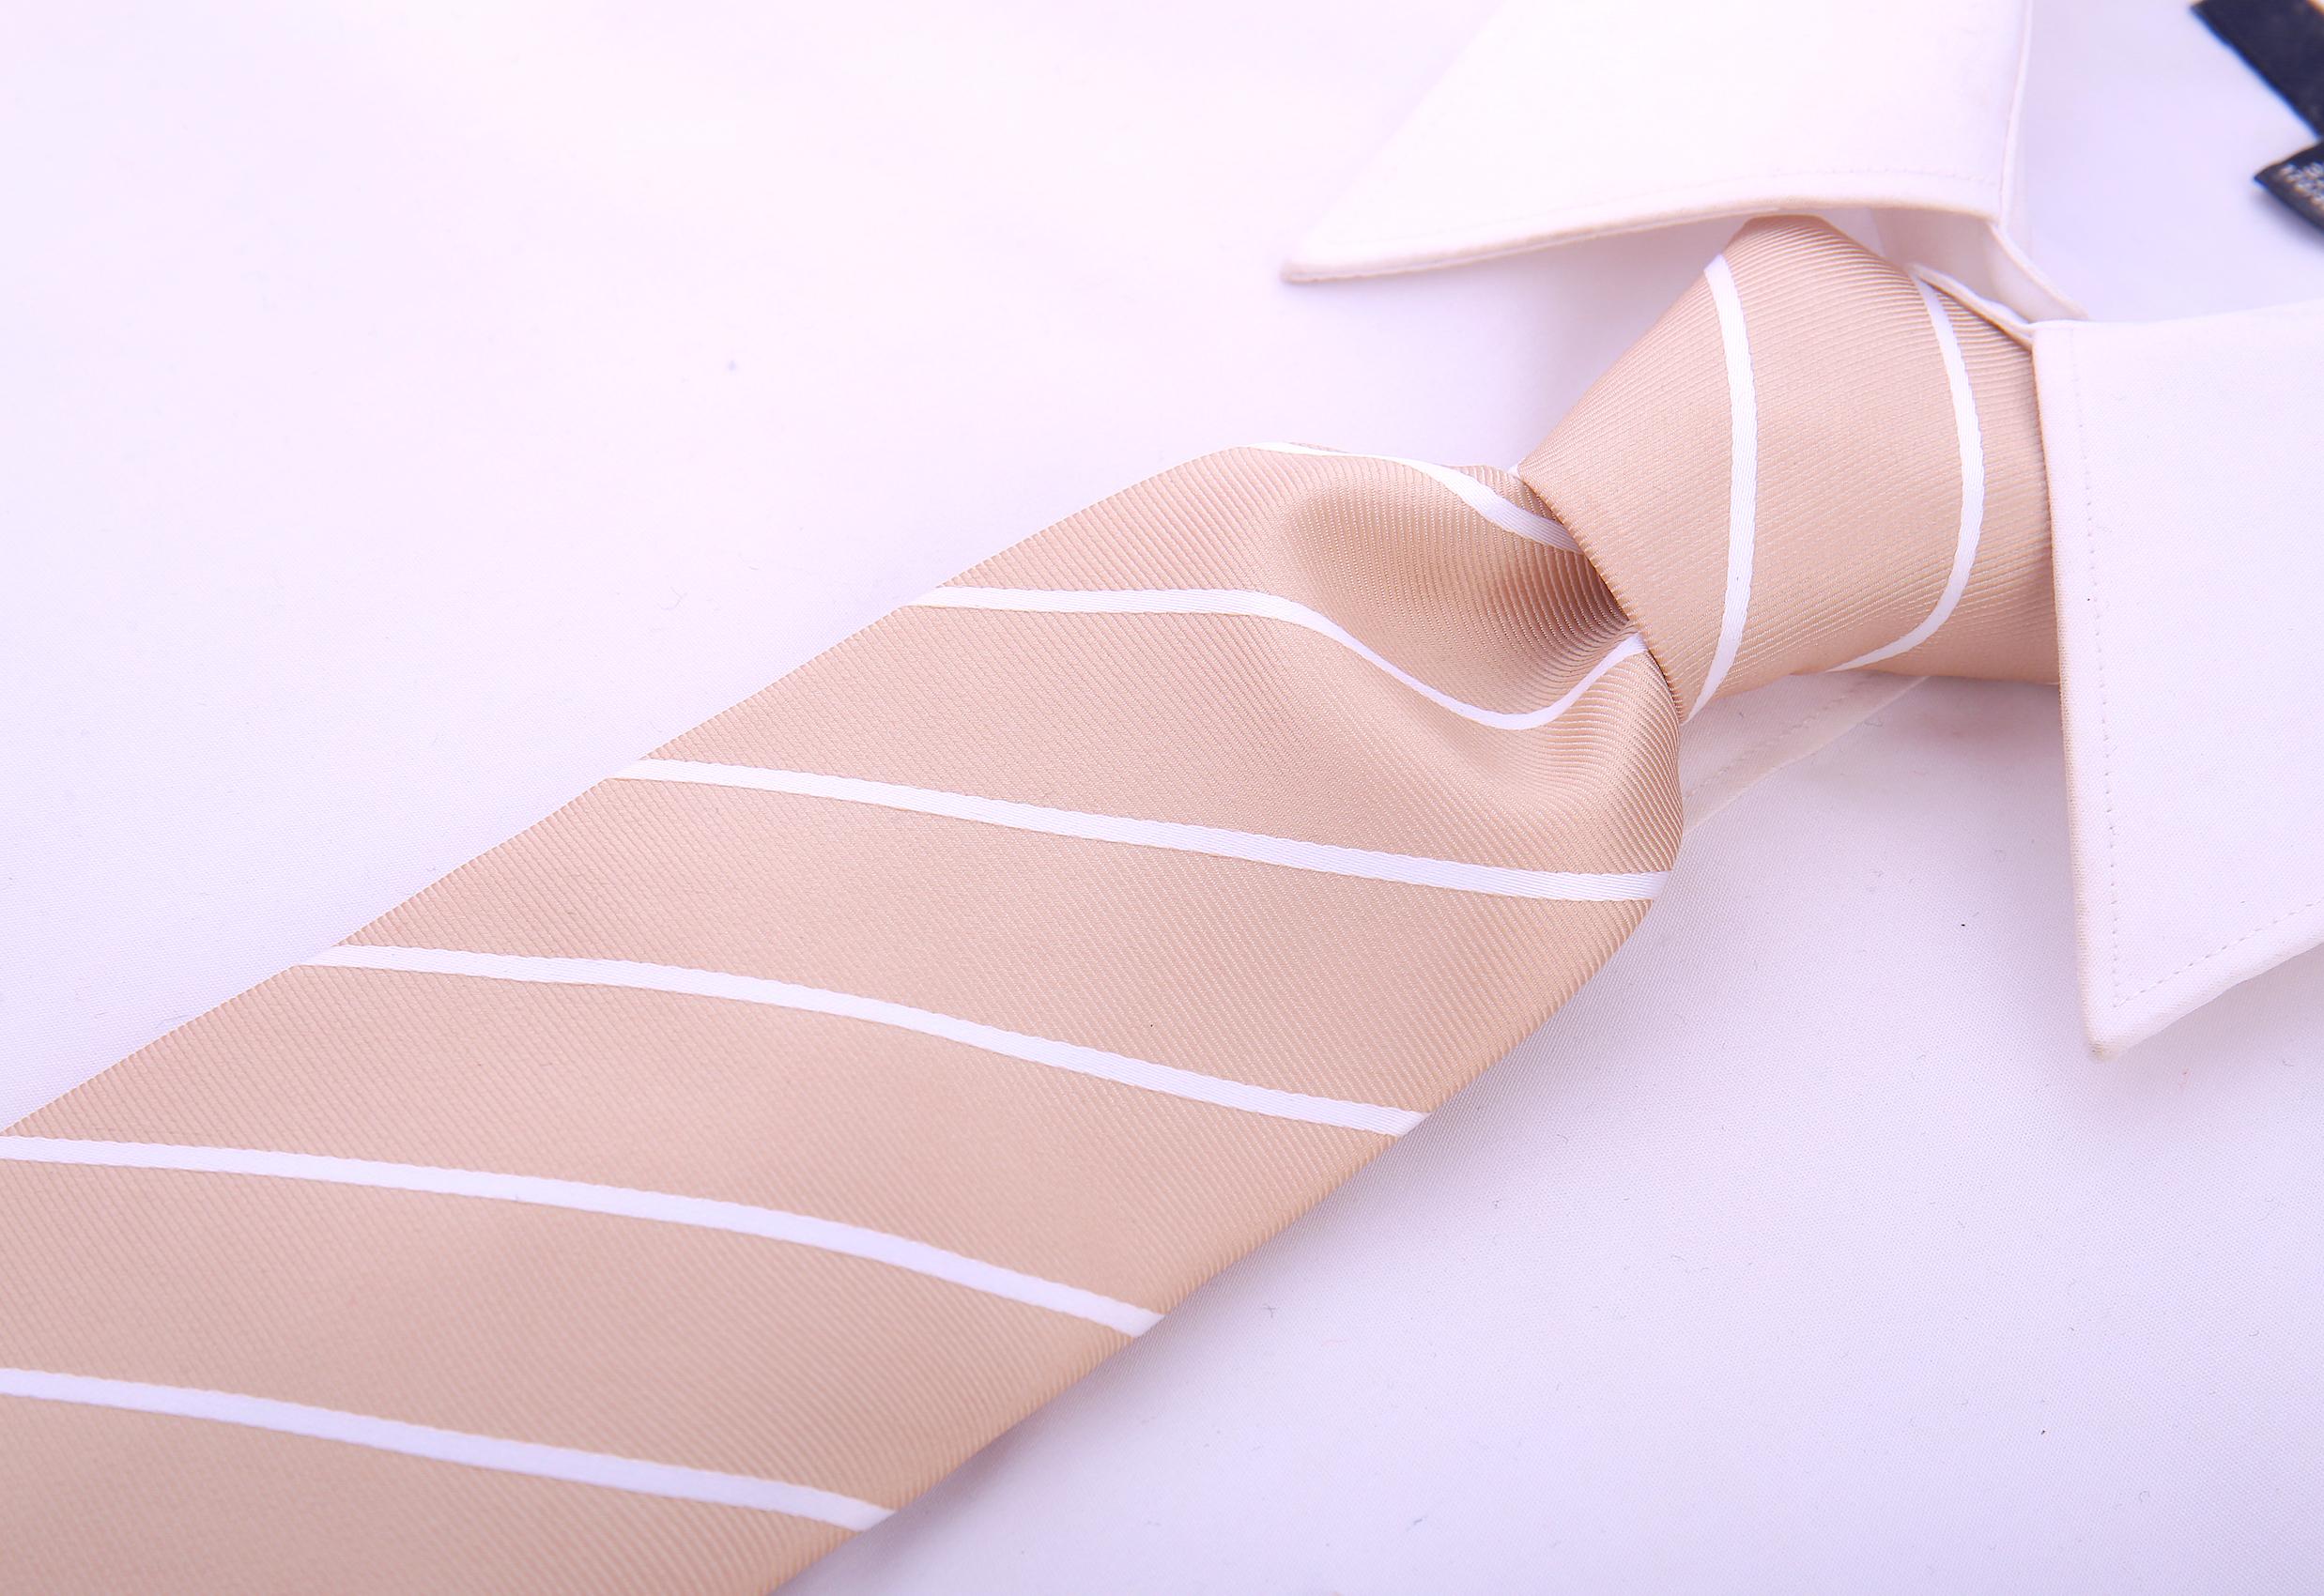 Scott-Allan-Mens-Necktie-Pencil-Striped-Mens-Tie thumbnail 7